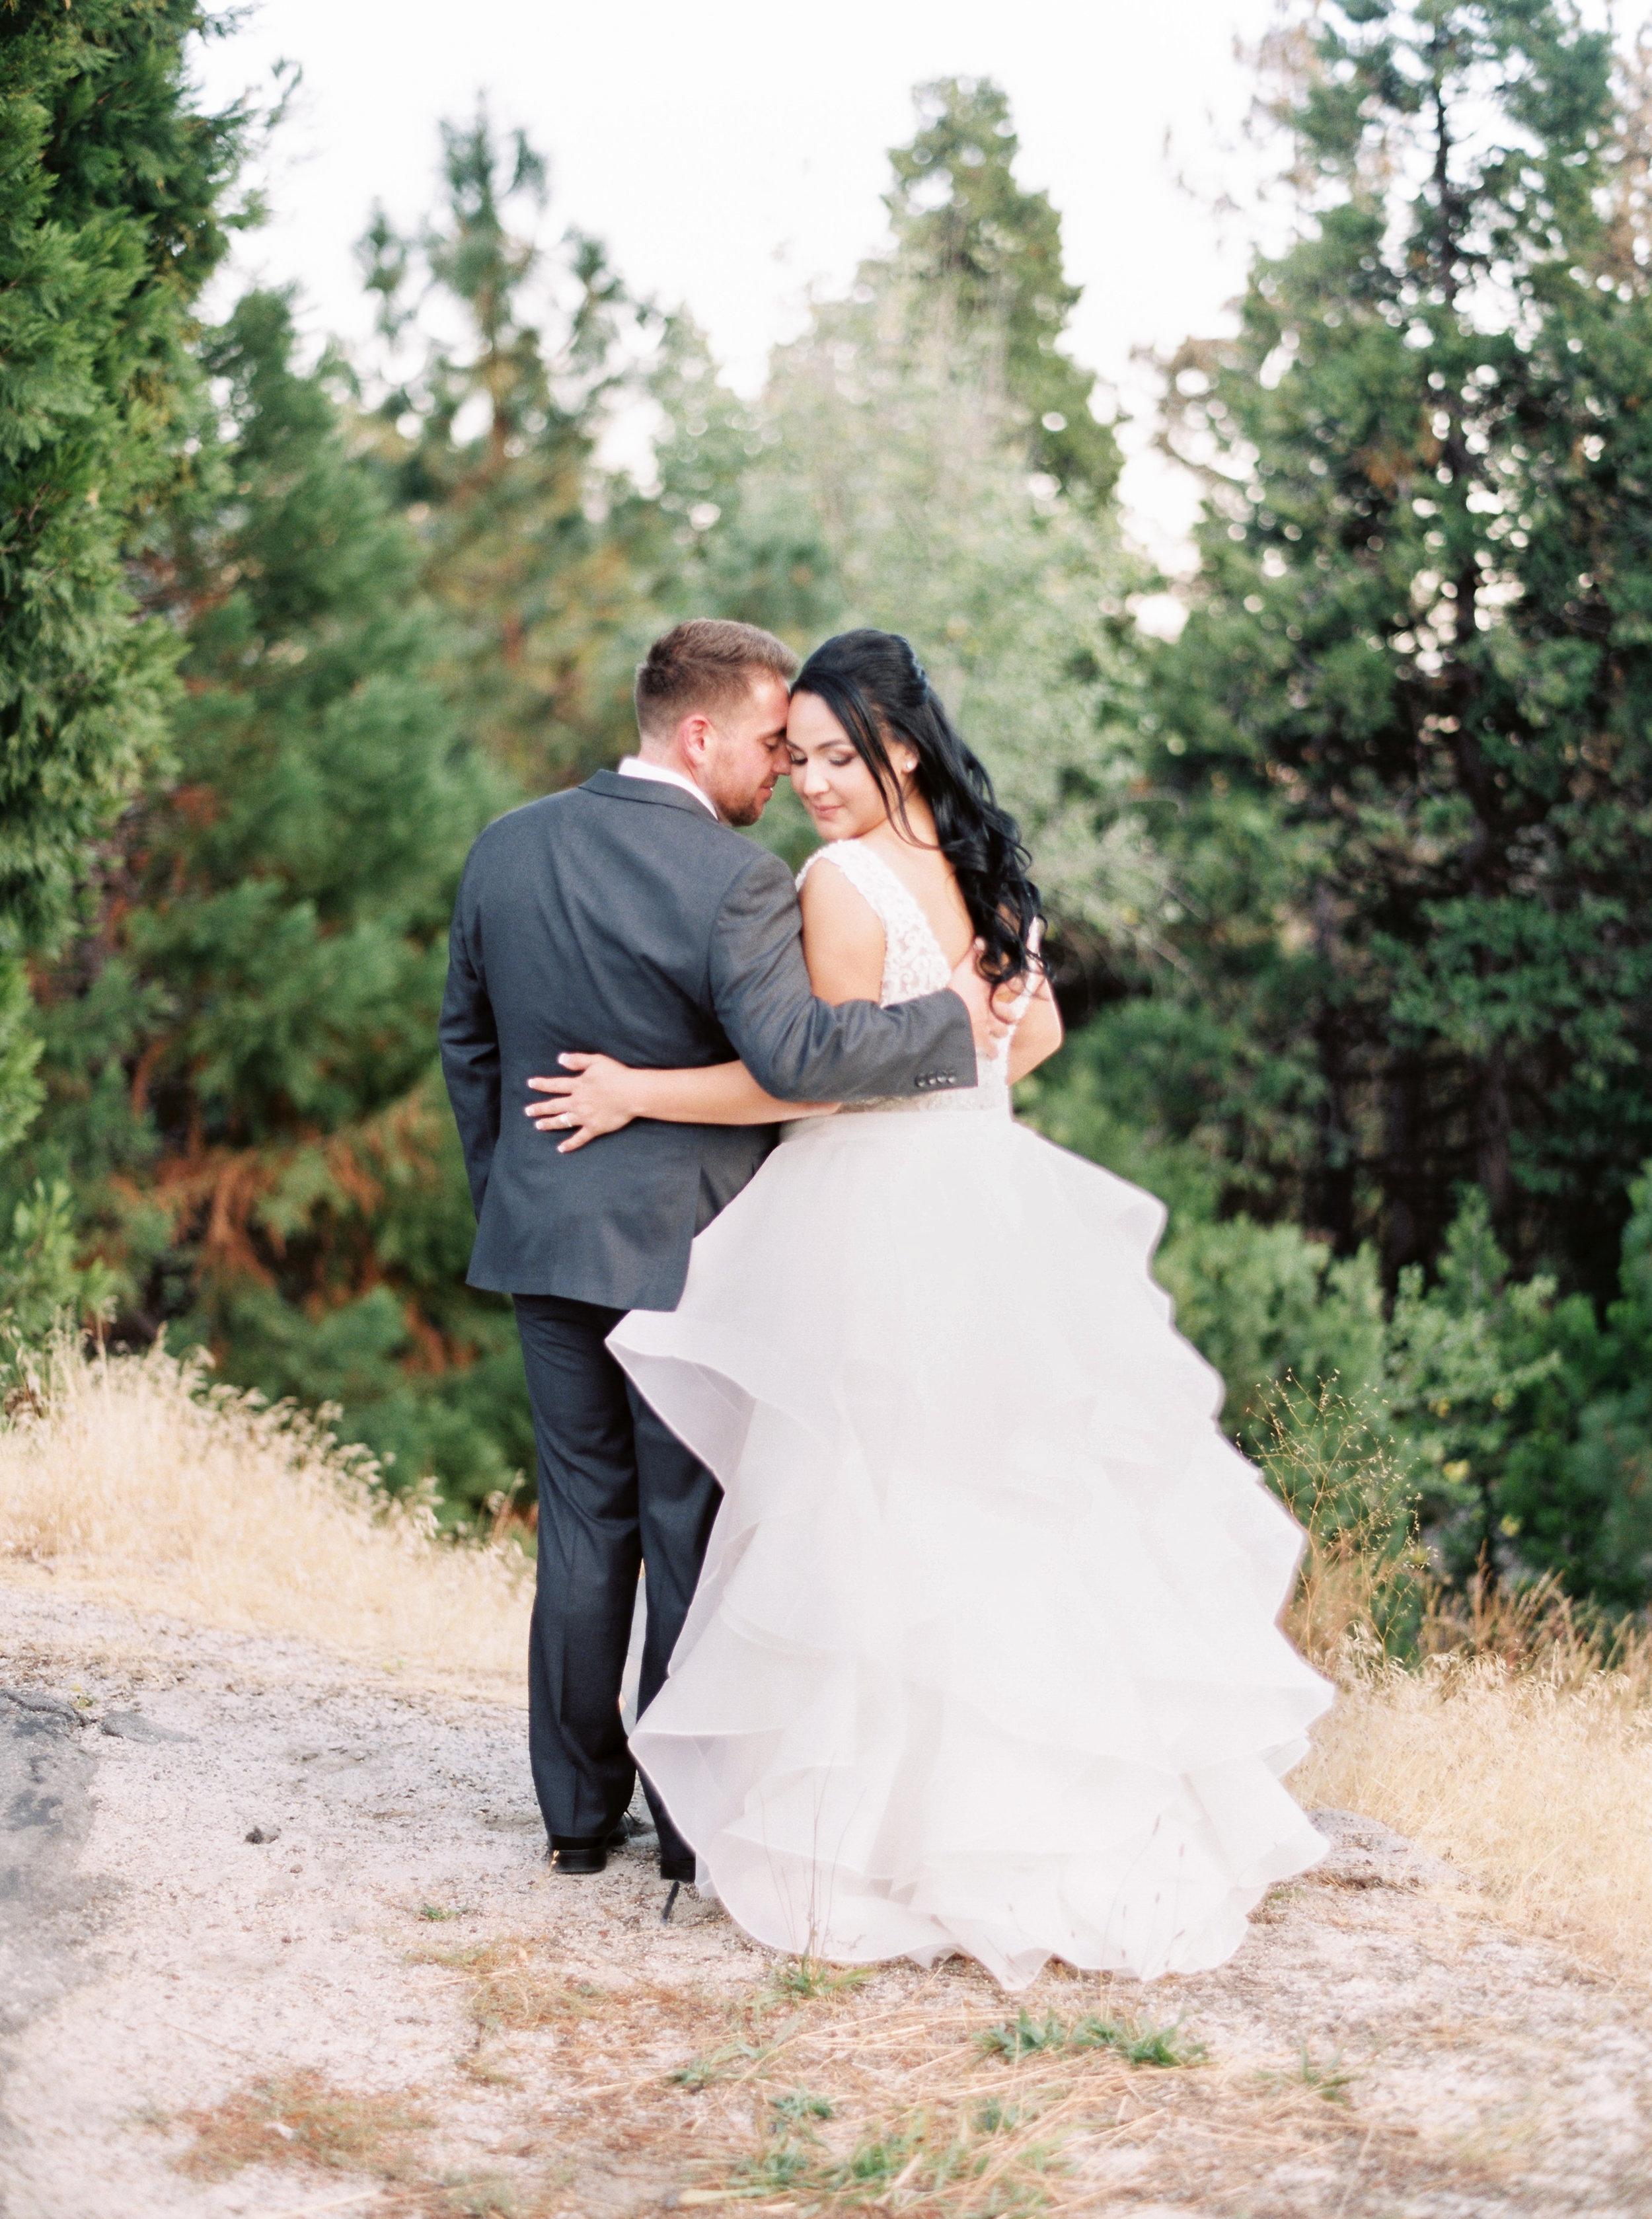 Tenaya-lodge-wedding-at-yosemite-national-park-california-10.jpg